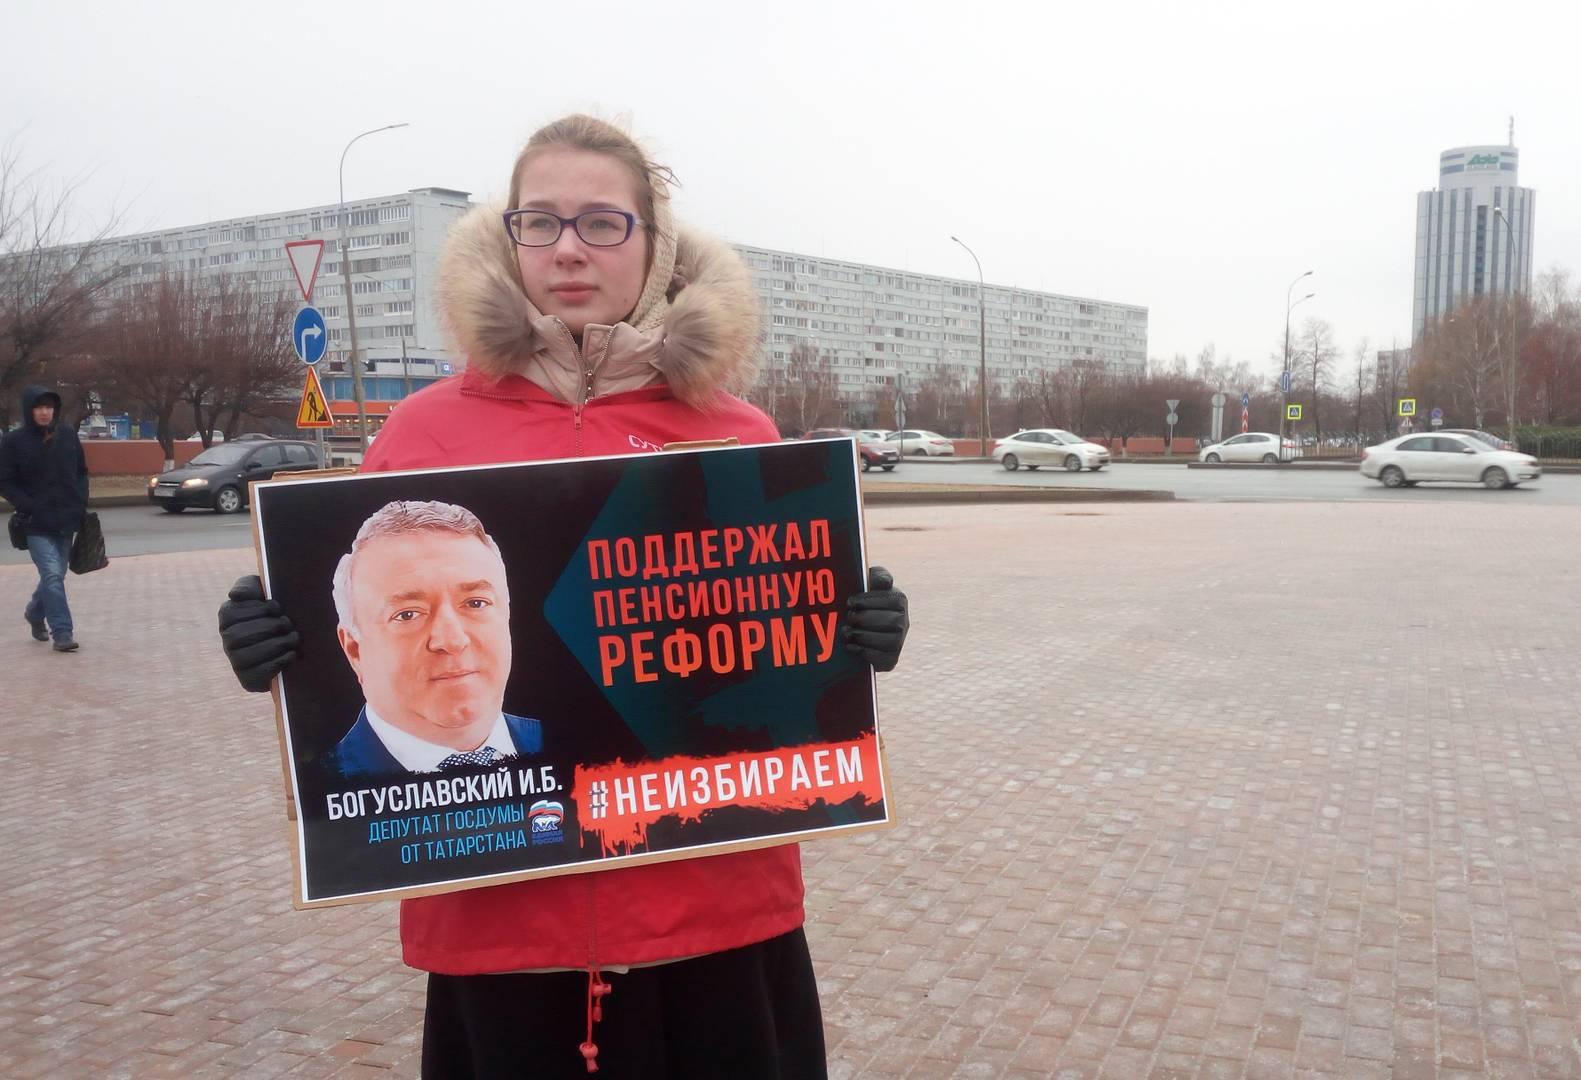 зампред комитета по промышленности Богуславский И.Б.